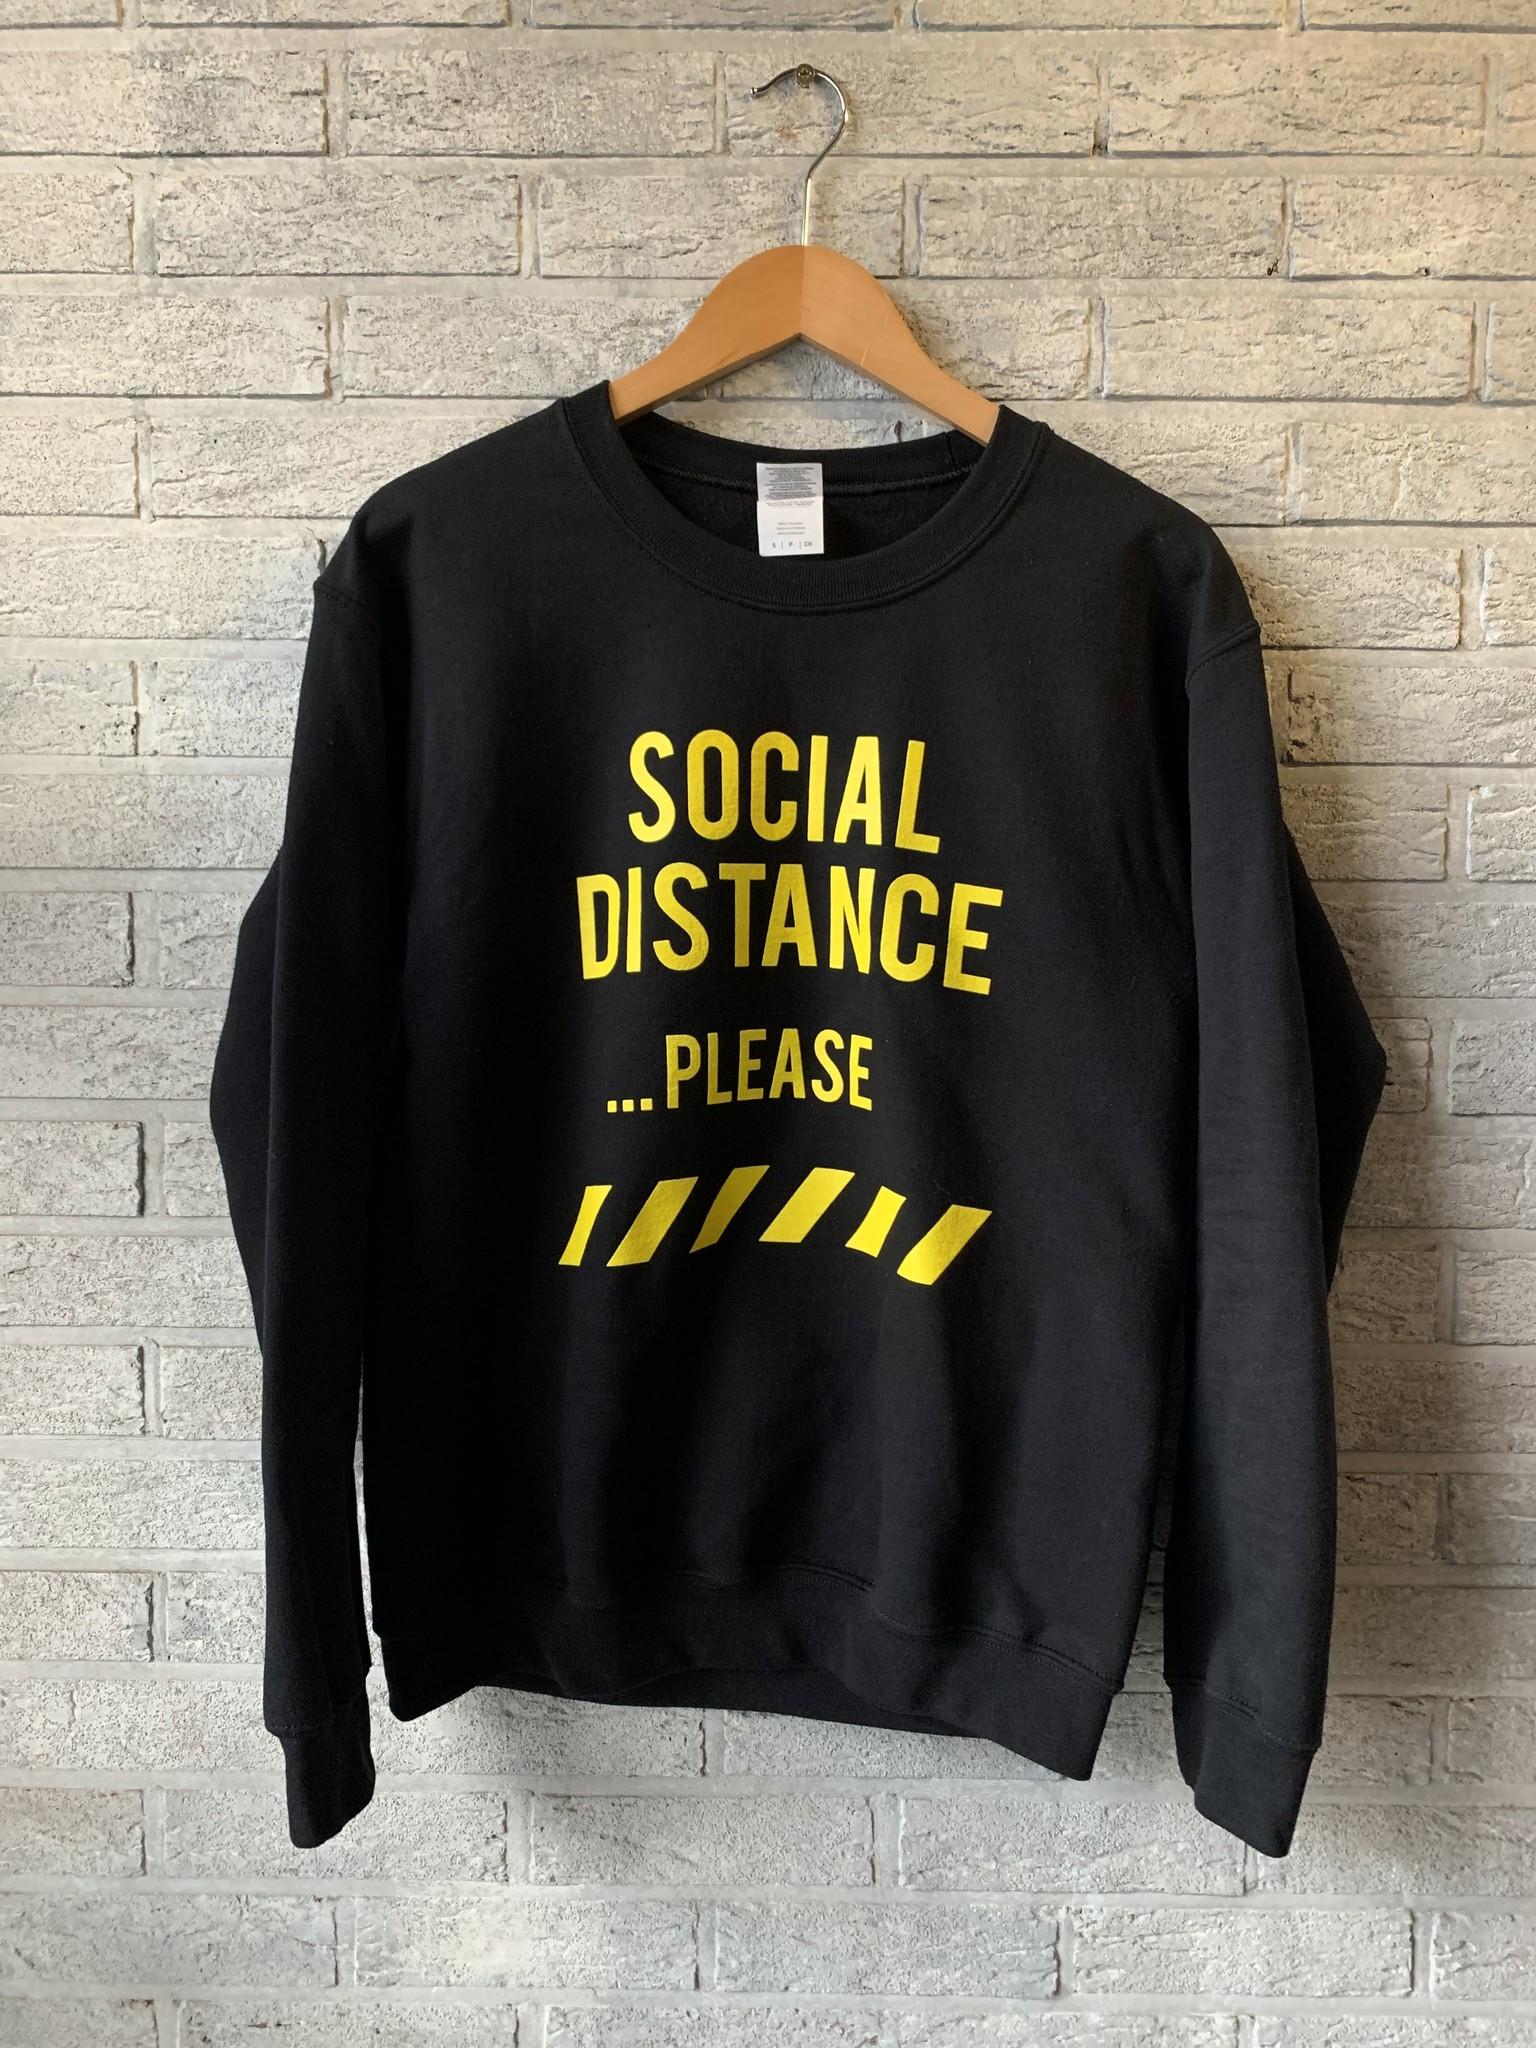 MYSHIRT SOCIAL DISTANCE SWEATSHIRT